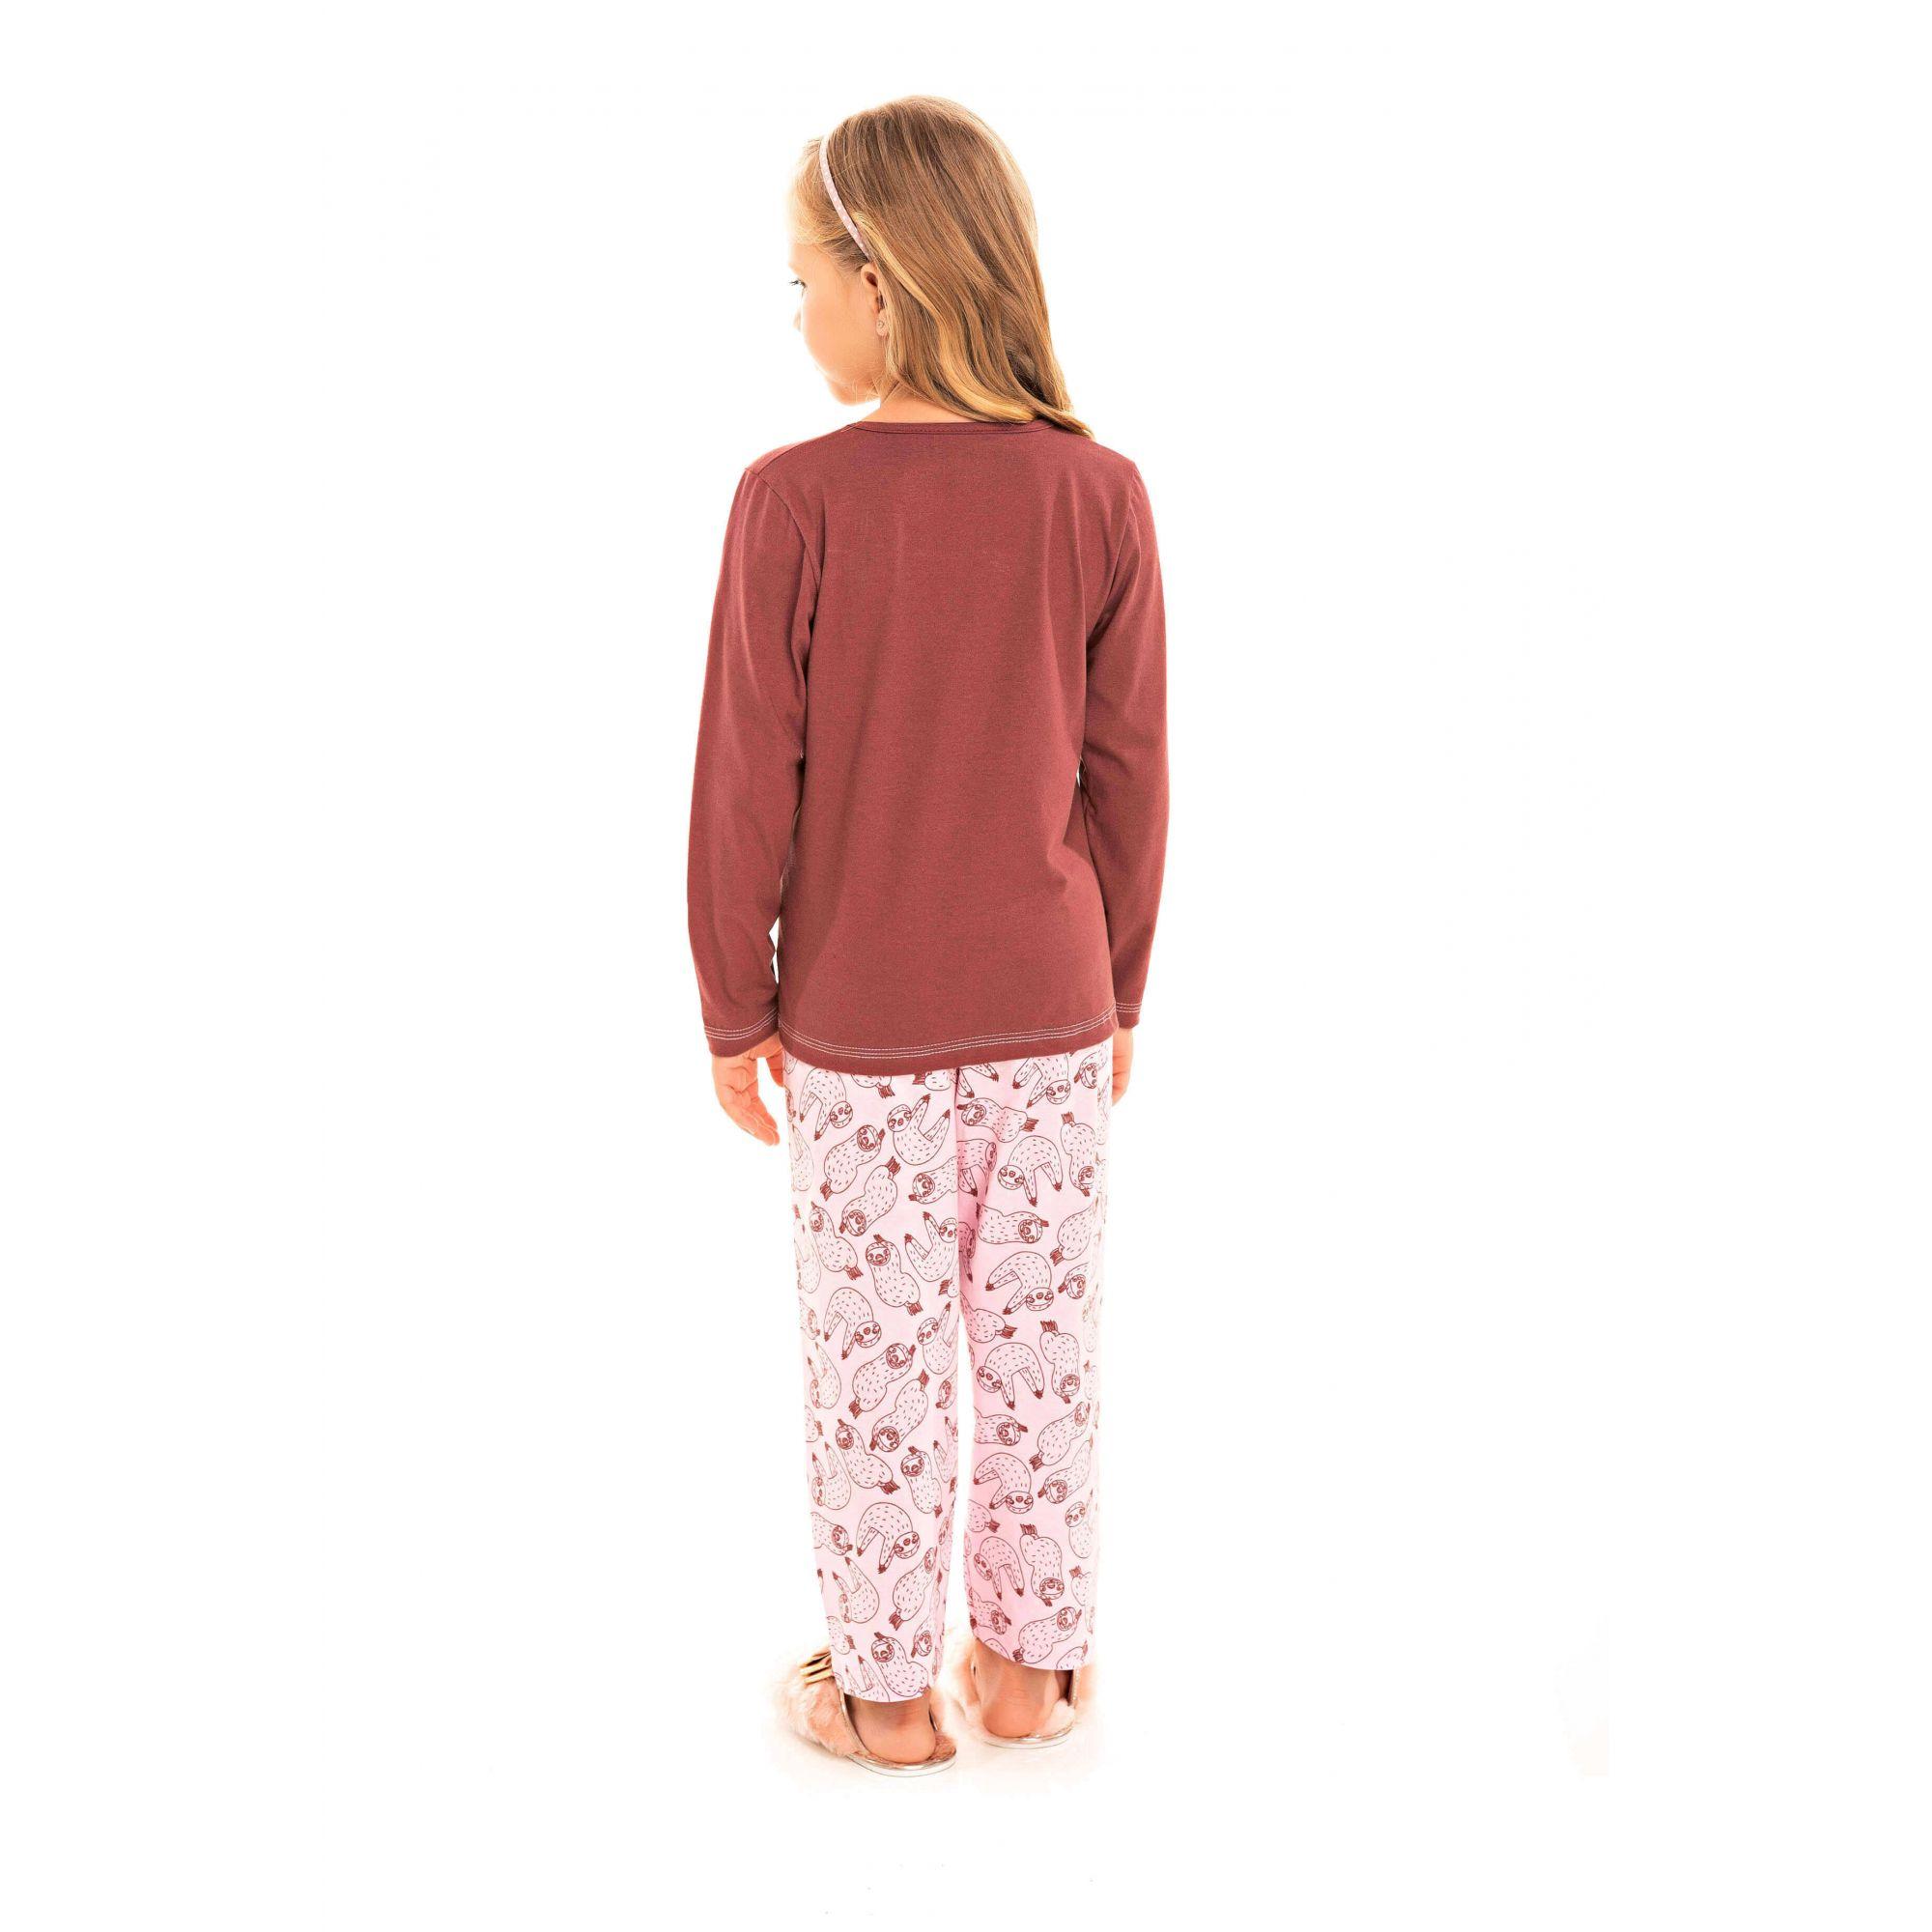 096/C - Pijama Infantil Feminino Bicho Preguiça